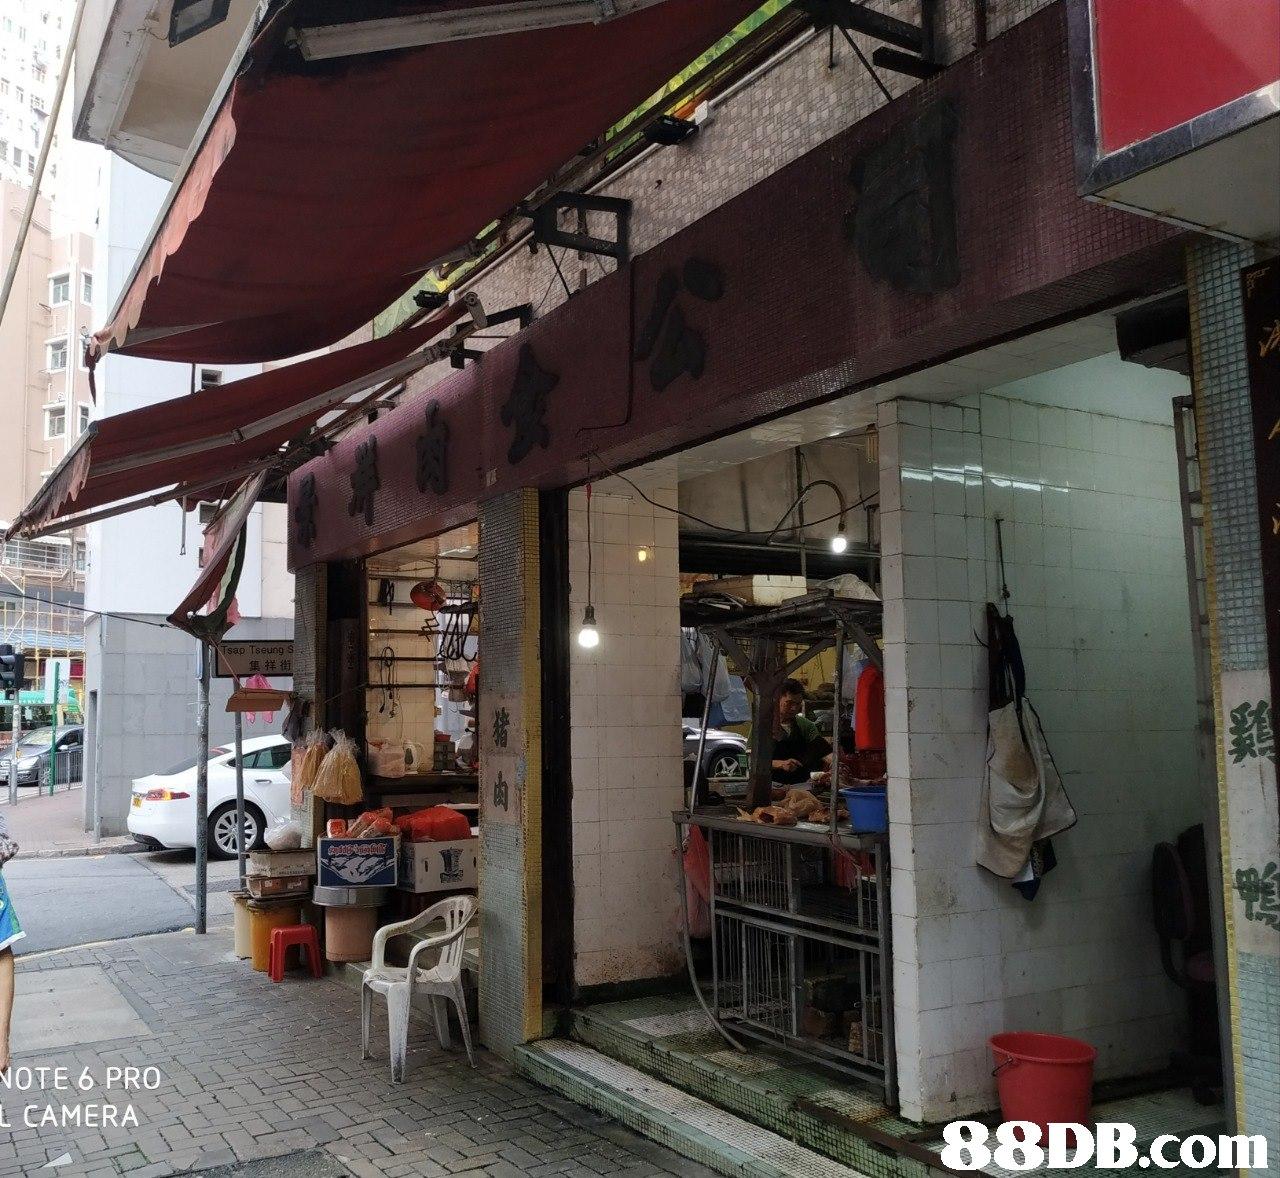 Tsap Tseung S 集祥街 OTE 6 PRO L CAMERA   Building,